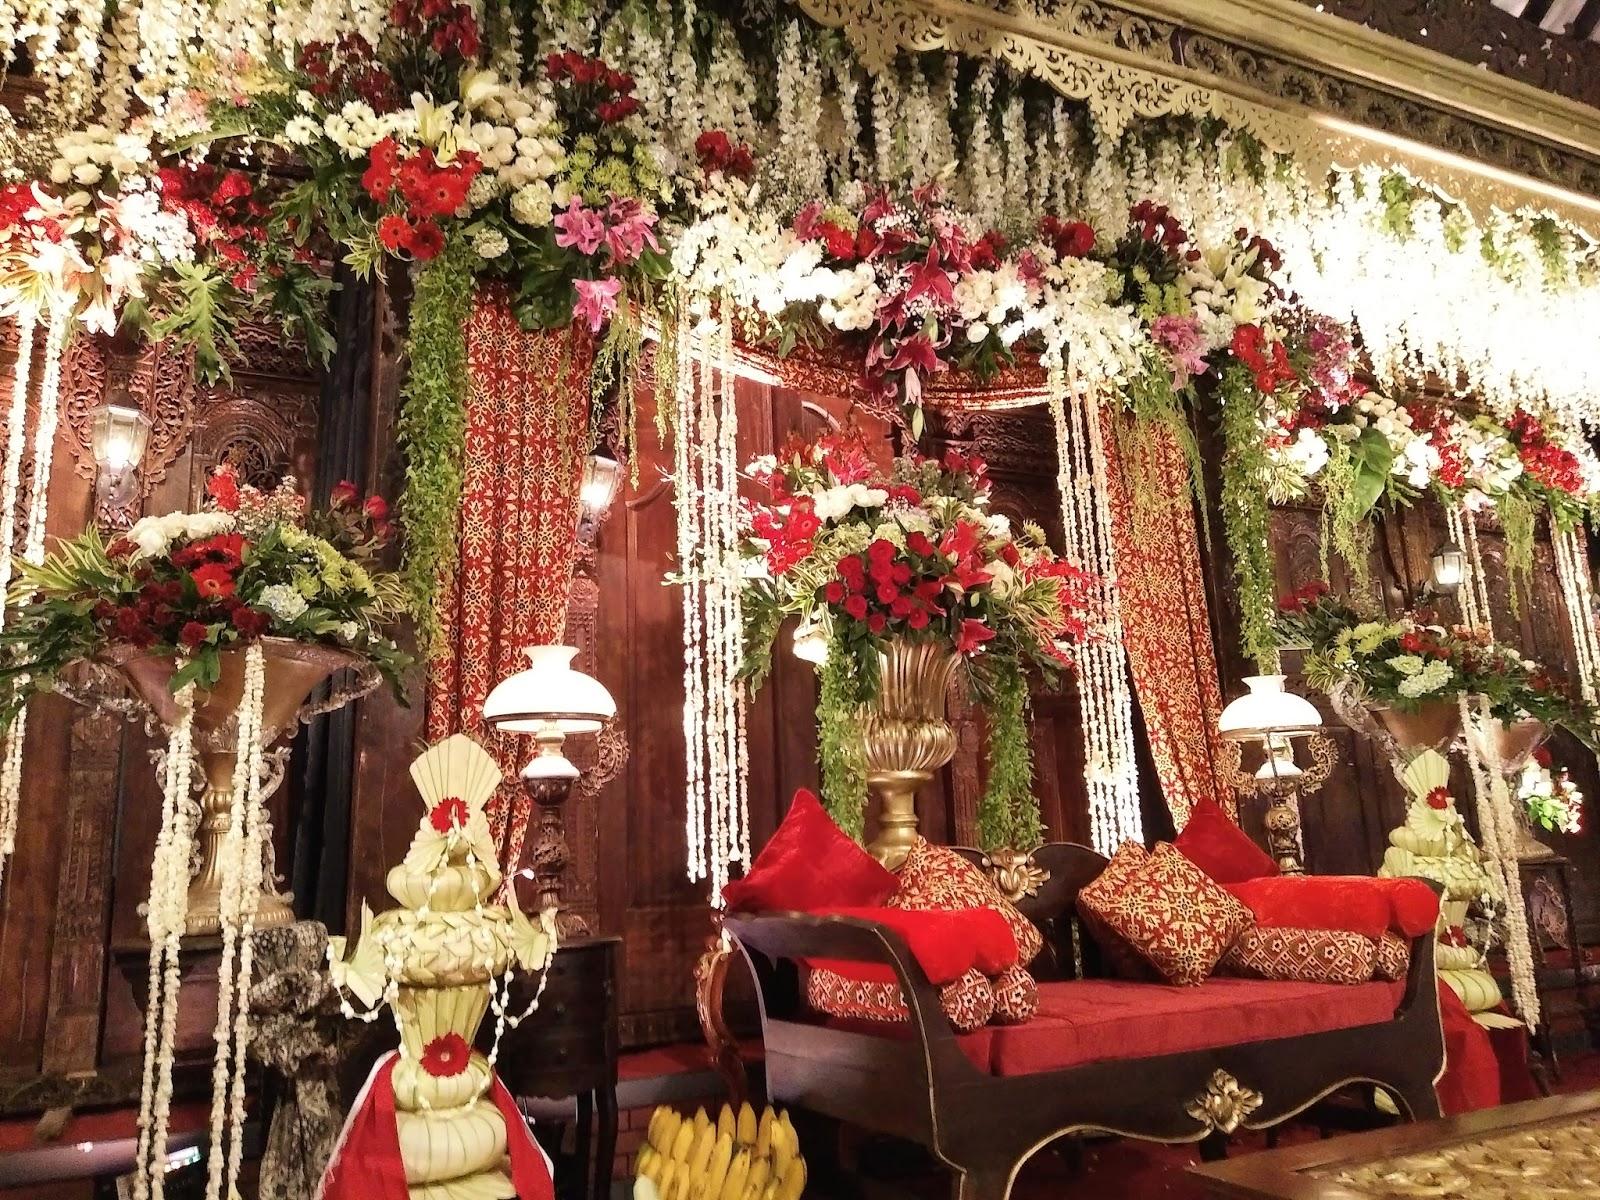 dekorasi solo asmoro decoration dekorasi pernikahan rizky